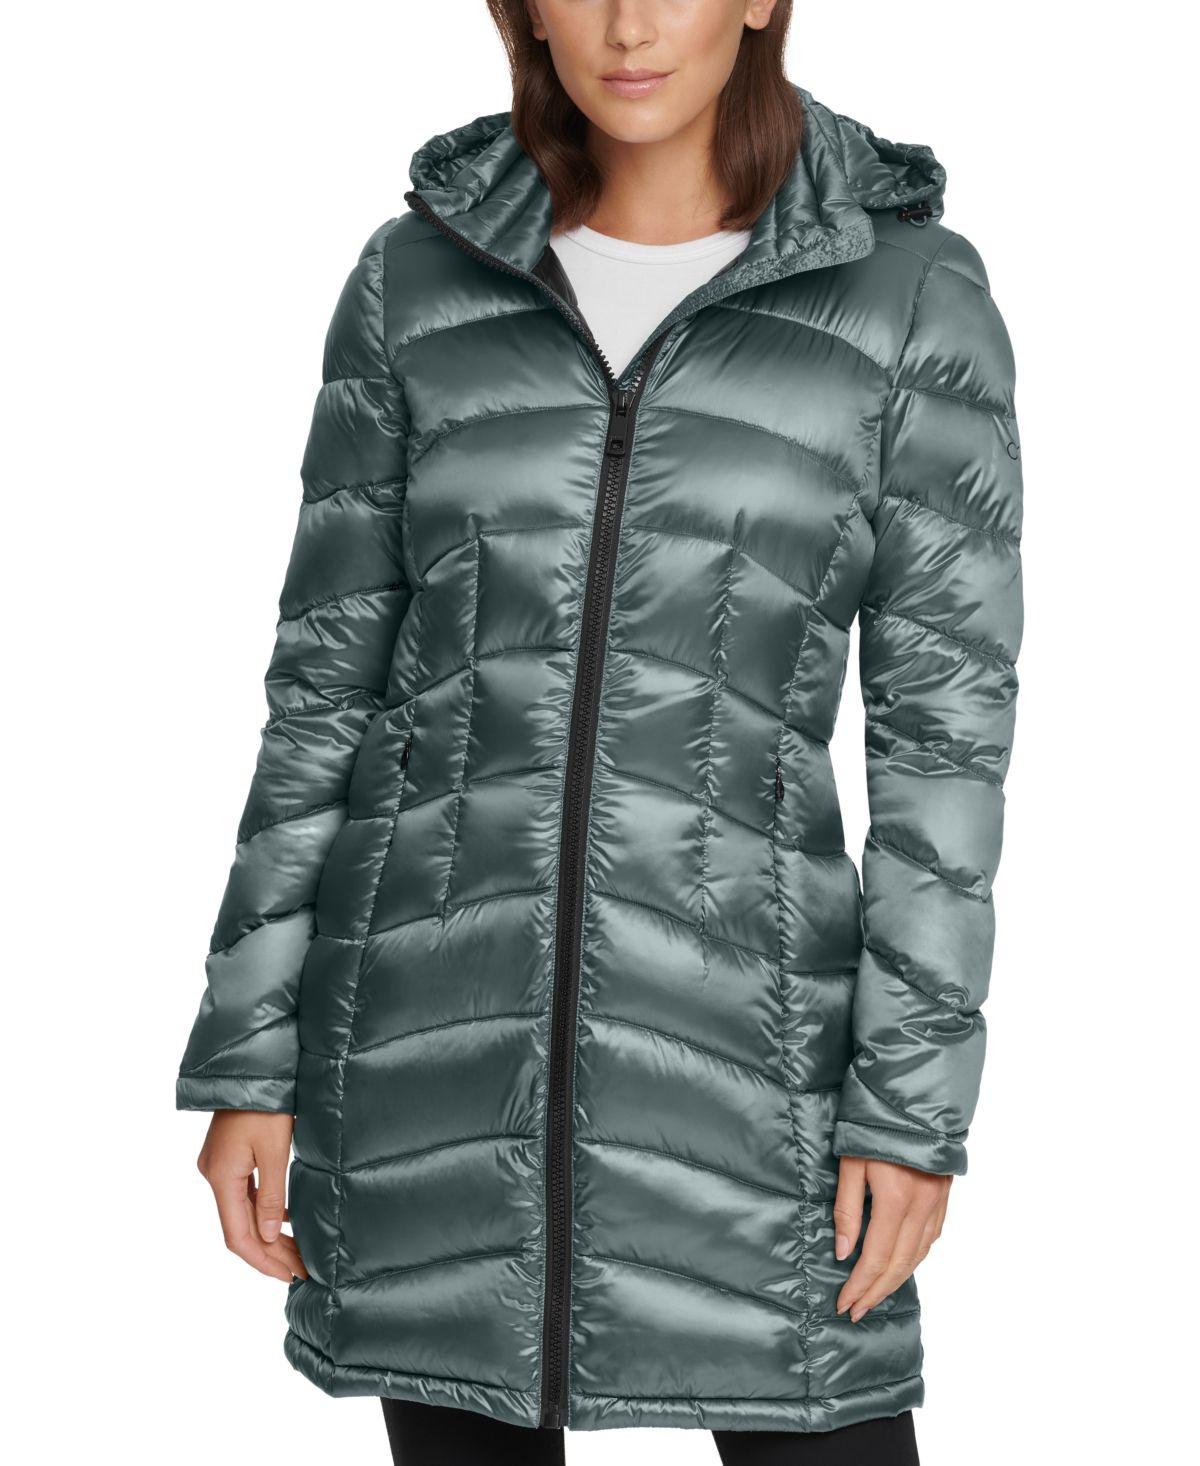 Calvin Klein Shine Hooded Packable Down Puffer Coat Created For Macy S Reviews Coats Women Macy S Down Puffer Coat Puffer Coat Coats For Women [ 1466 x 1200 Pixel ]